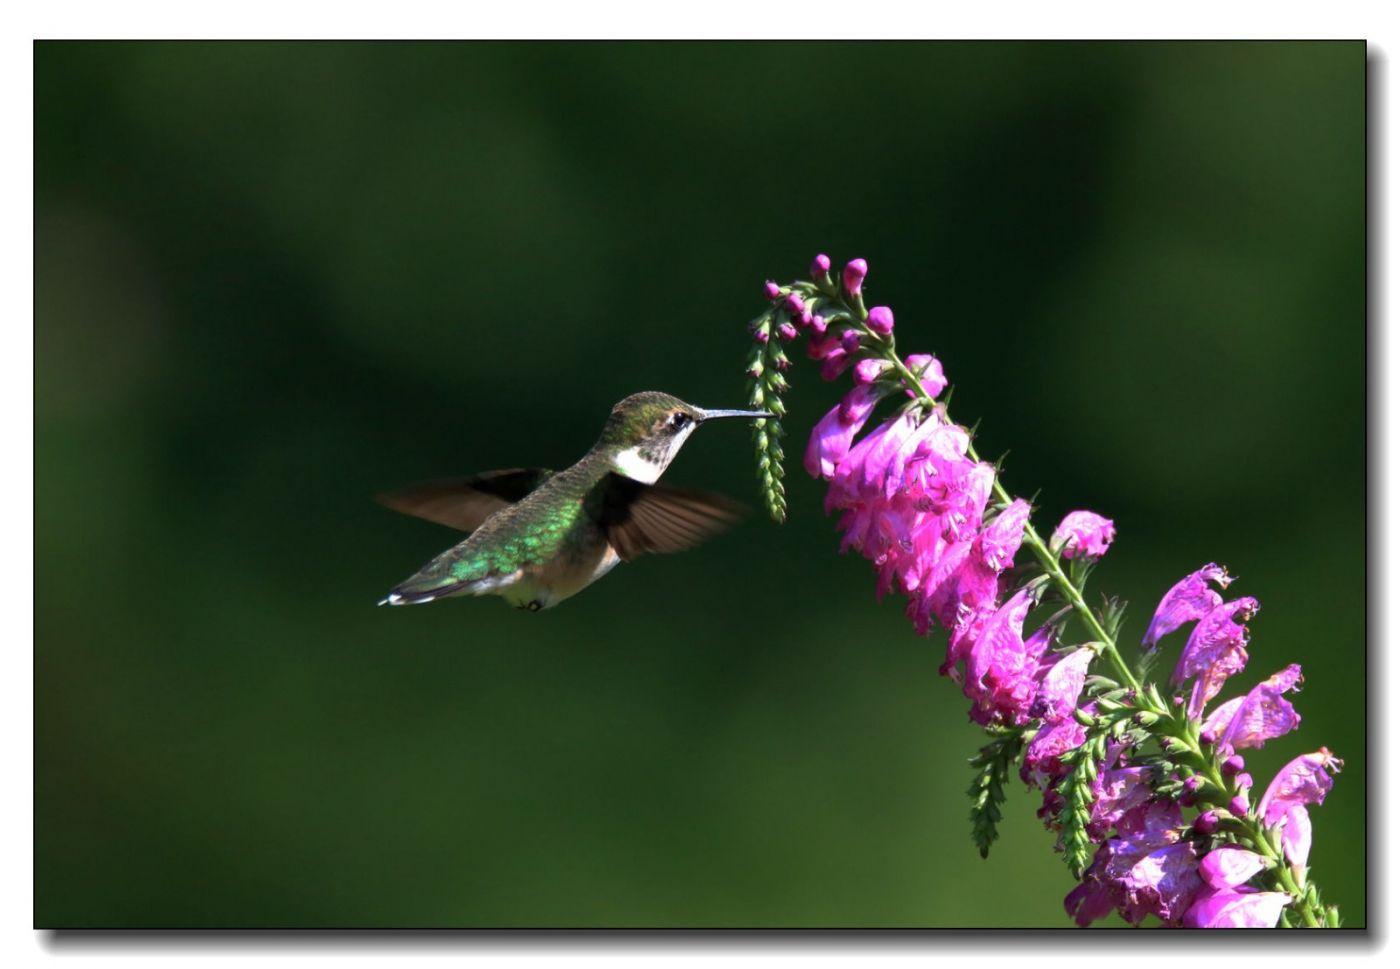 蜂鸟组图(五)_图1-5